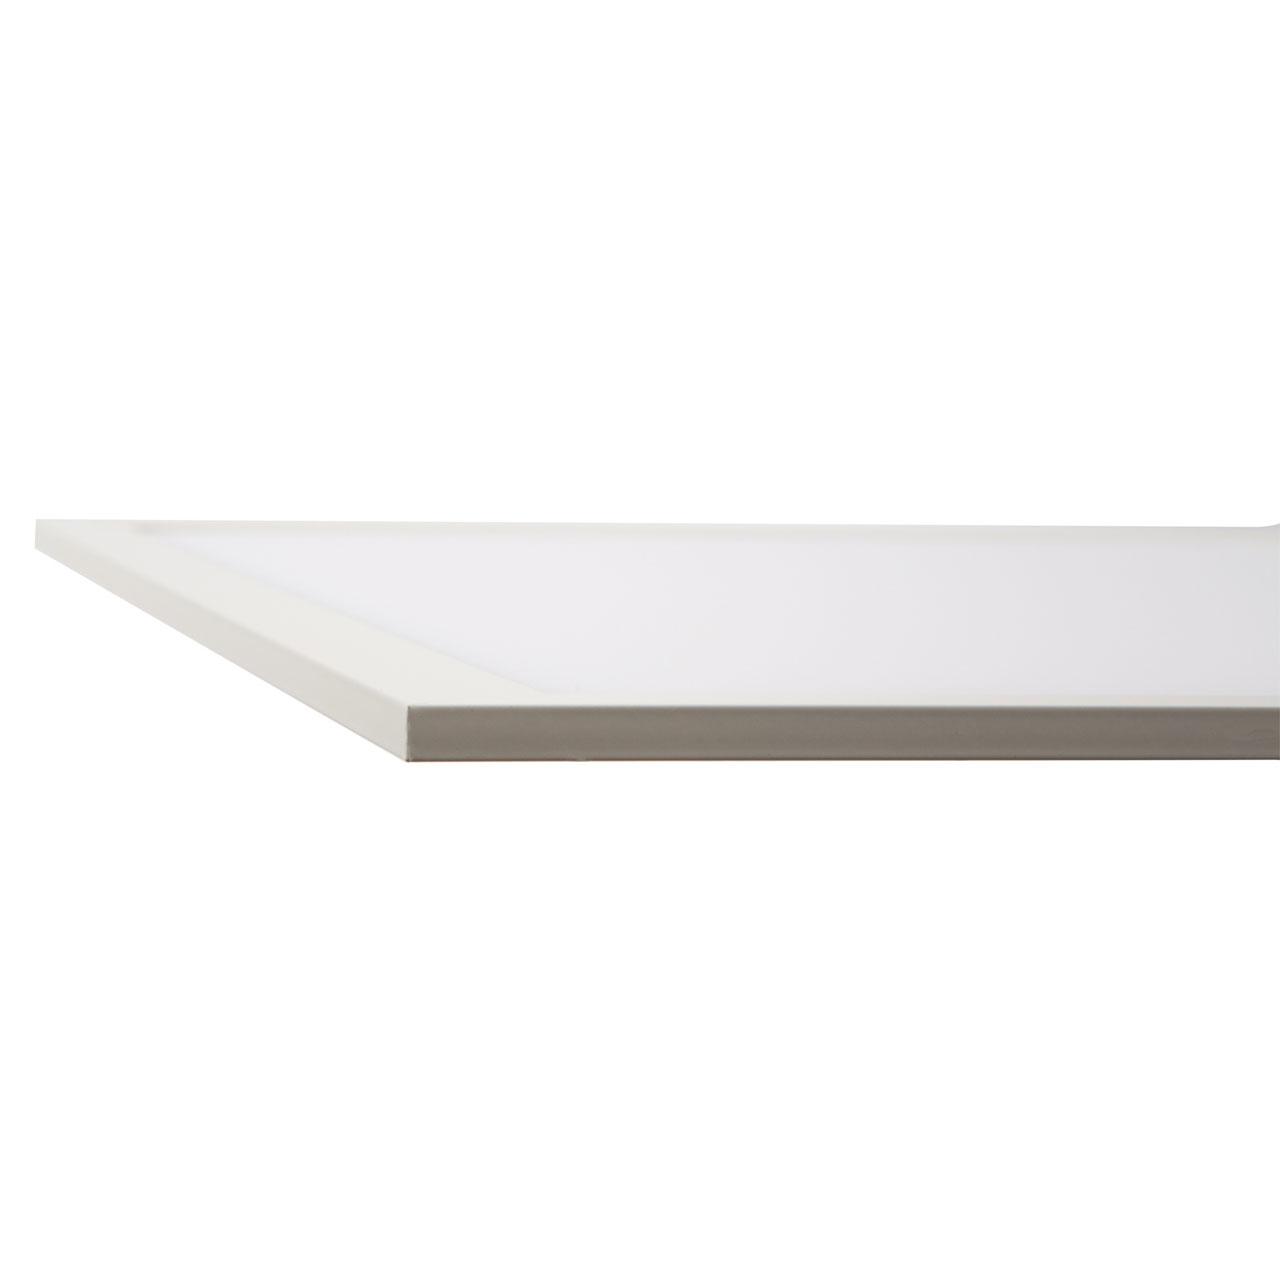 MUVA LED PANEEL 620x620 - MUVA Tech